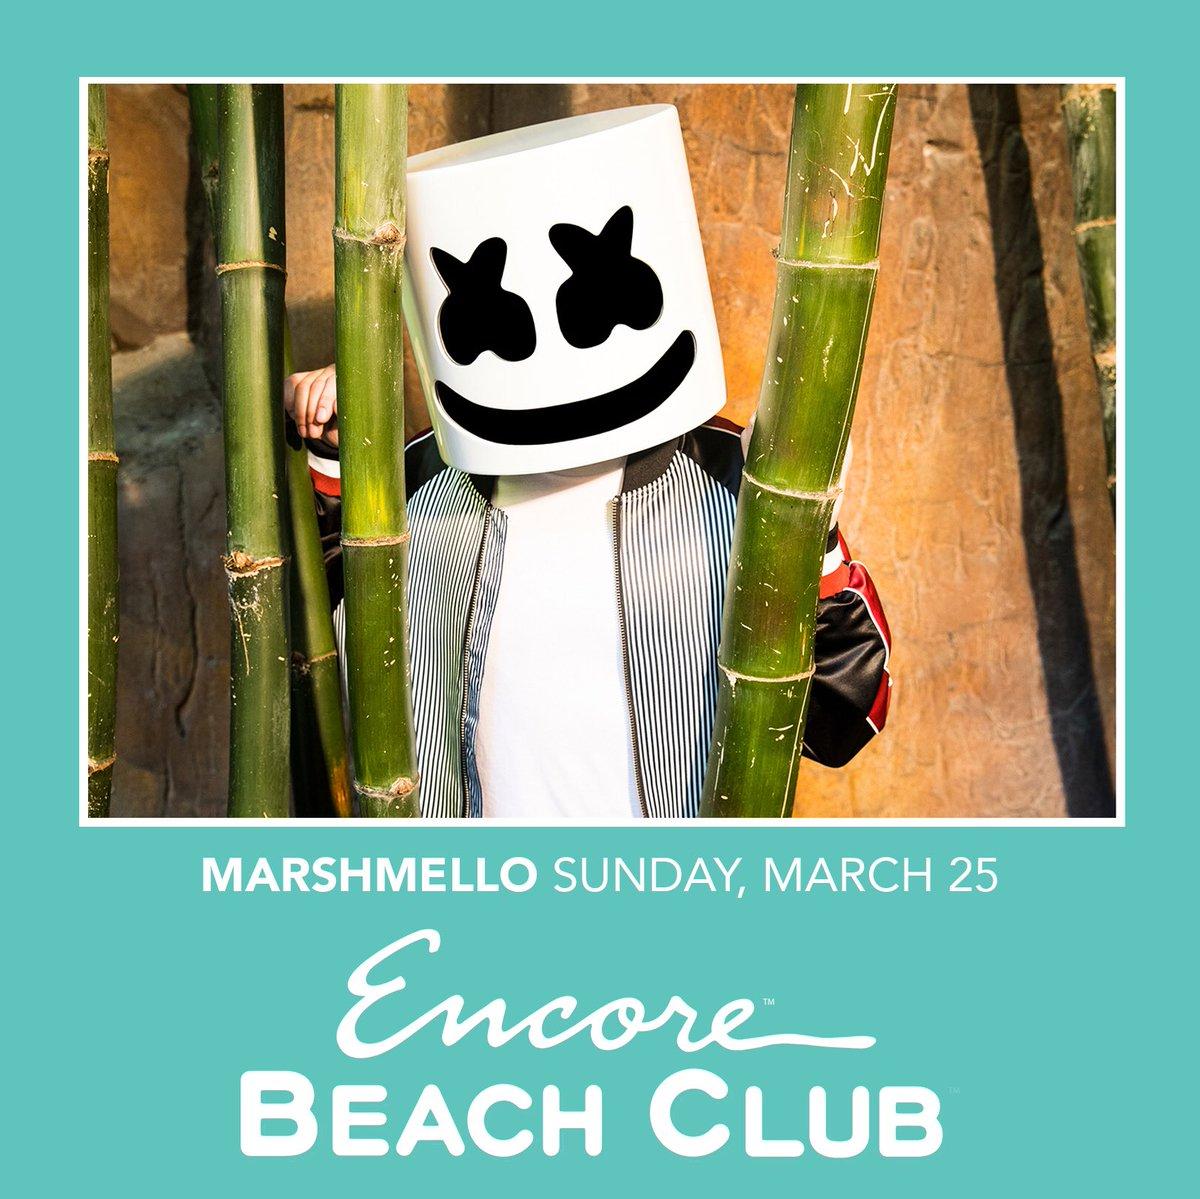 Excited for @EncoreBeachClub this weekend! Tix: wyn.lv/2Marshmello